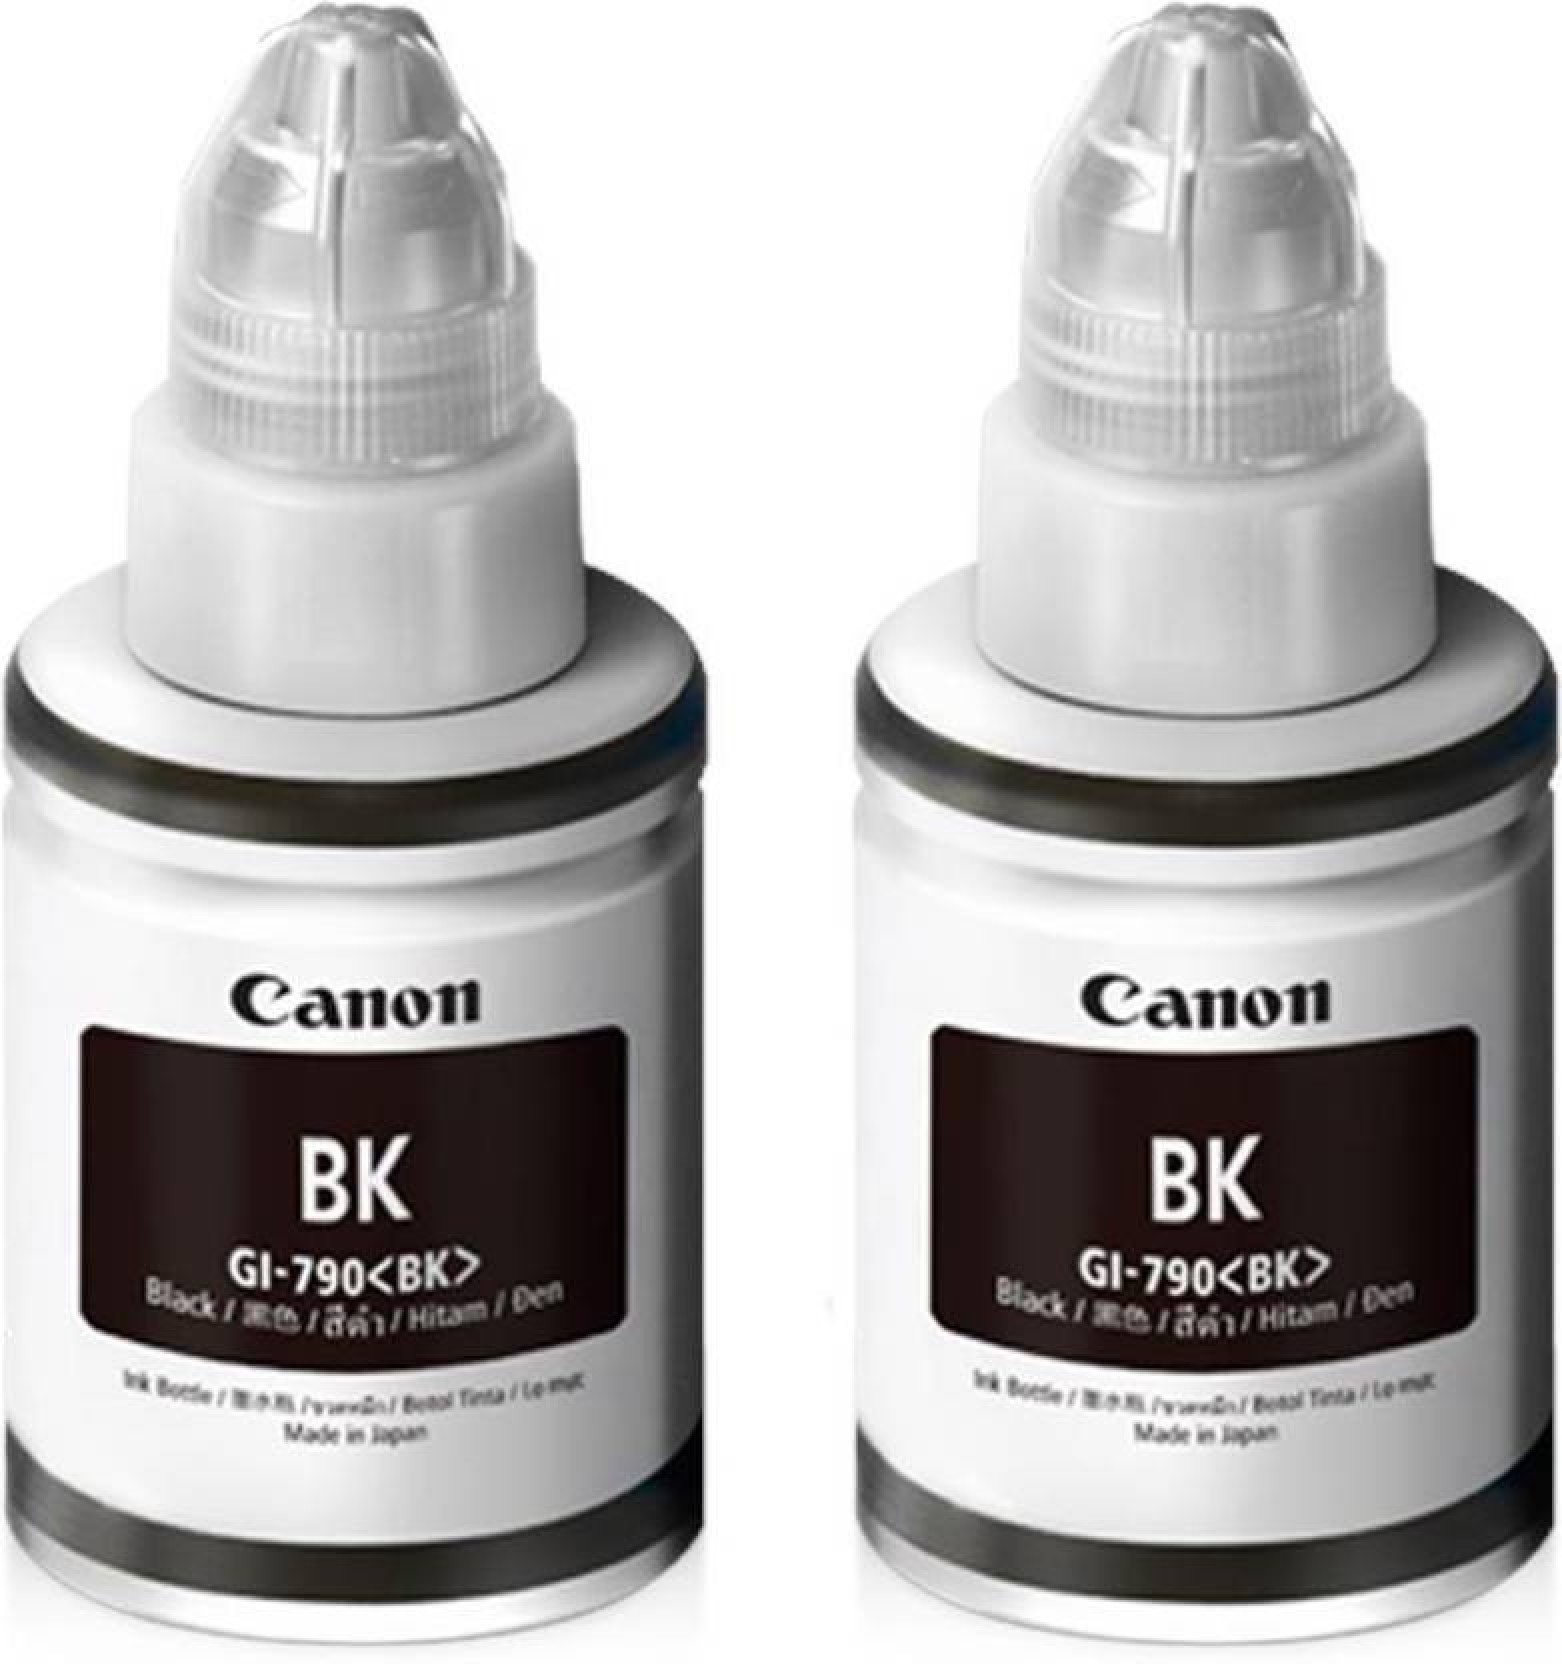 Canon Original Gi 790 Tinta Printer Magenta G1000g2000g2003g300070 Pigment Ultimate Plus Uv G1000 G2000 G2003 G3000 Yellow 70 Ml Fast Print Photo Source Add To Cart